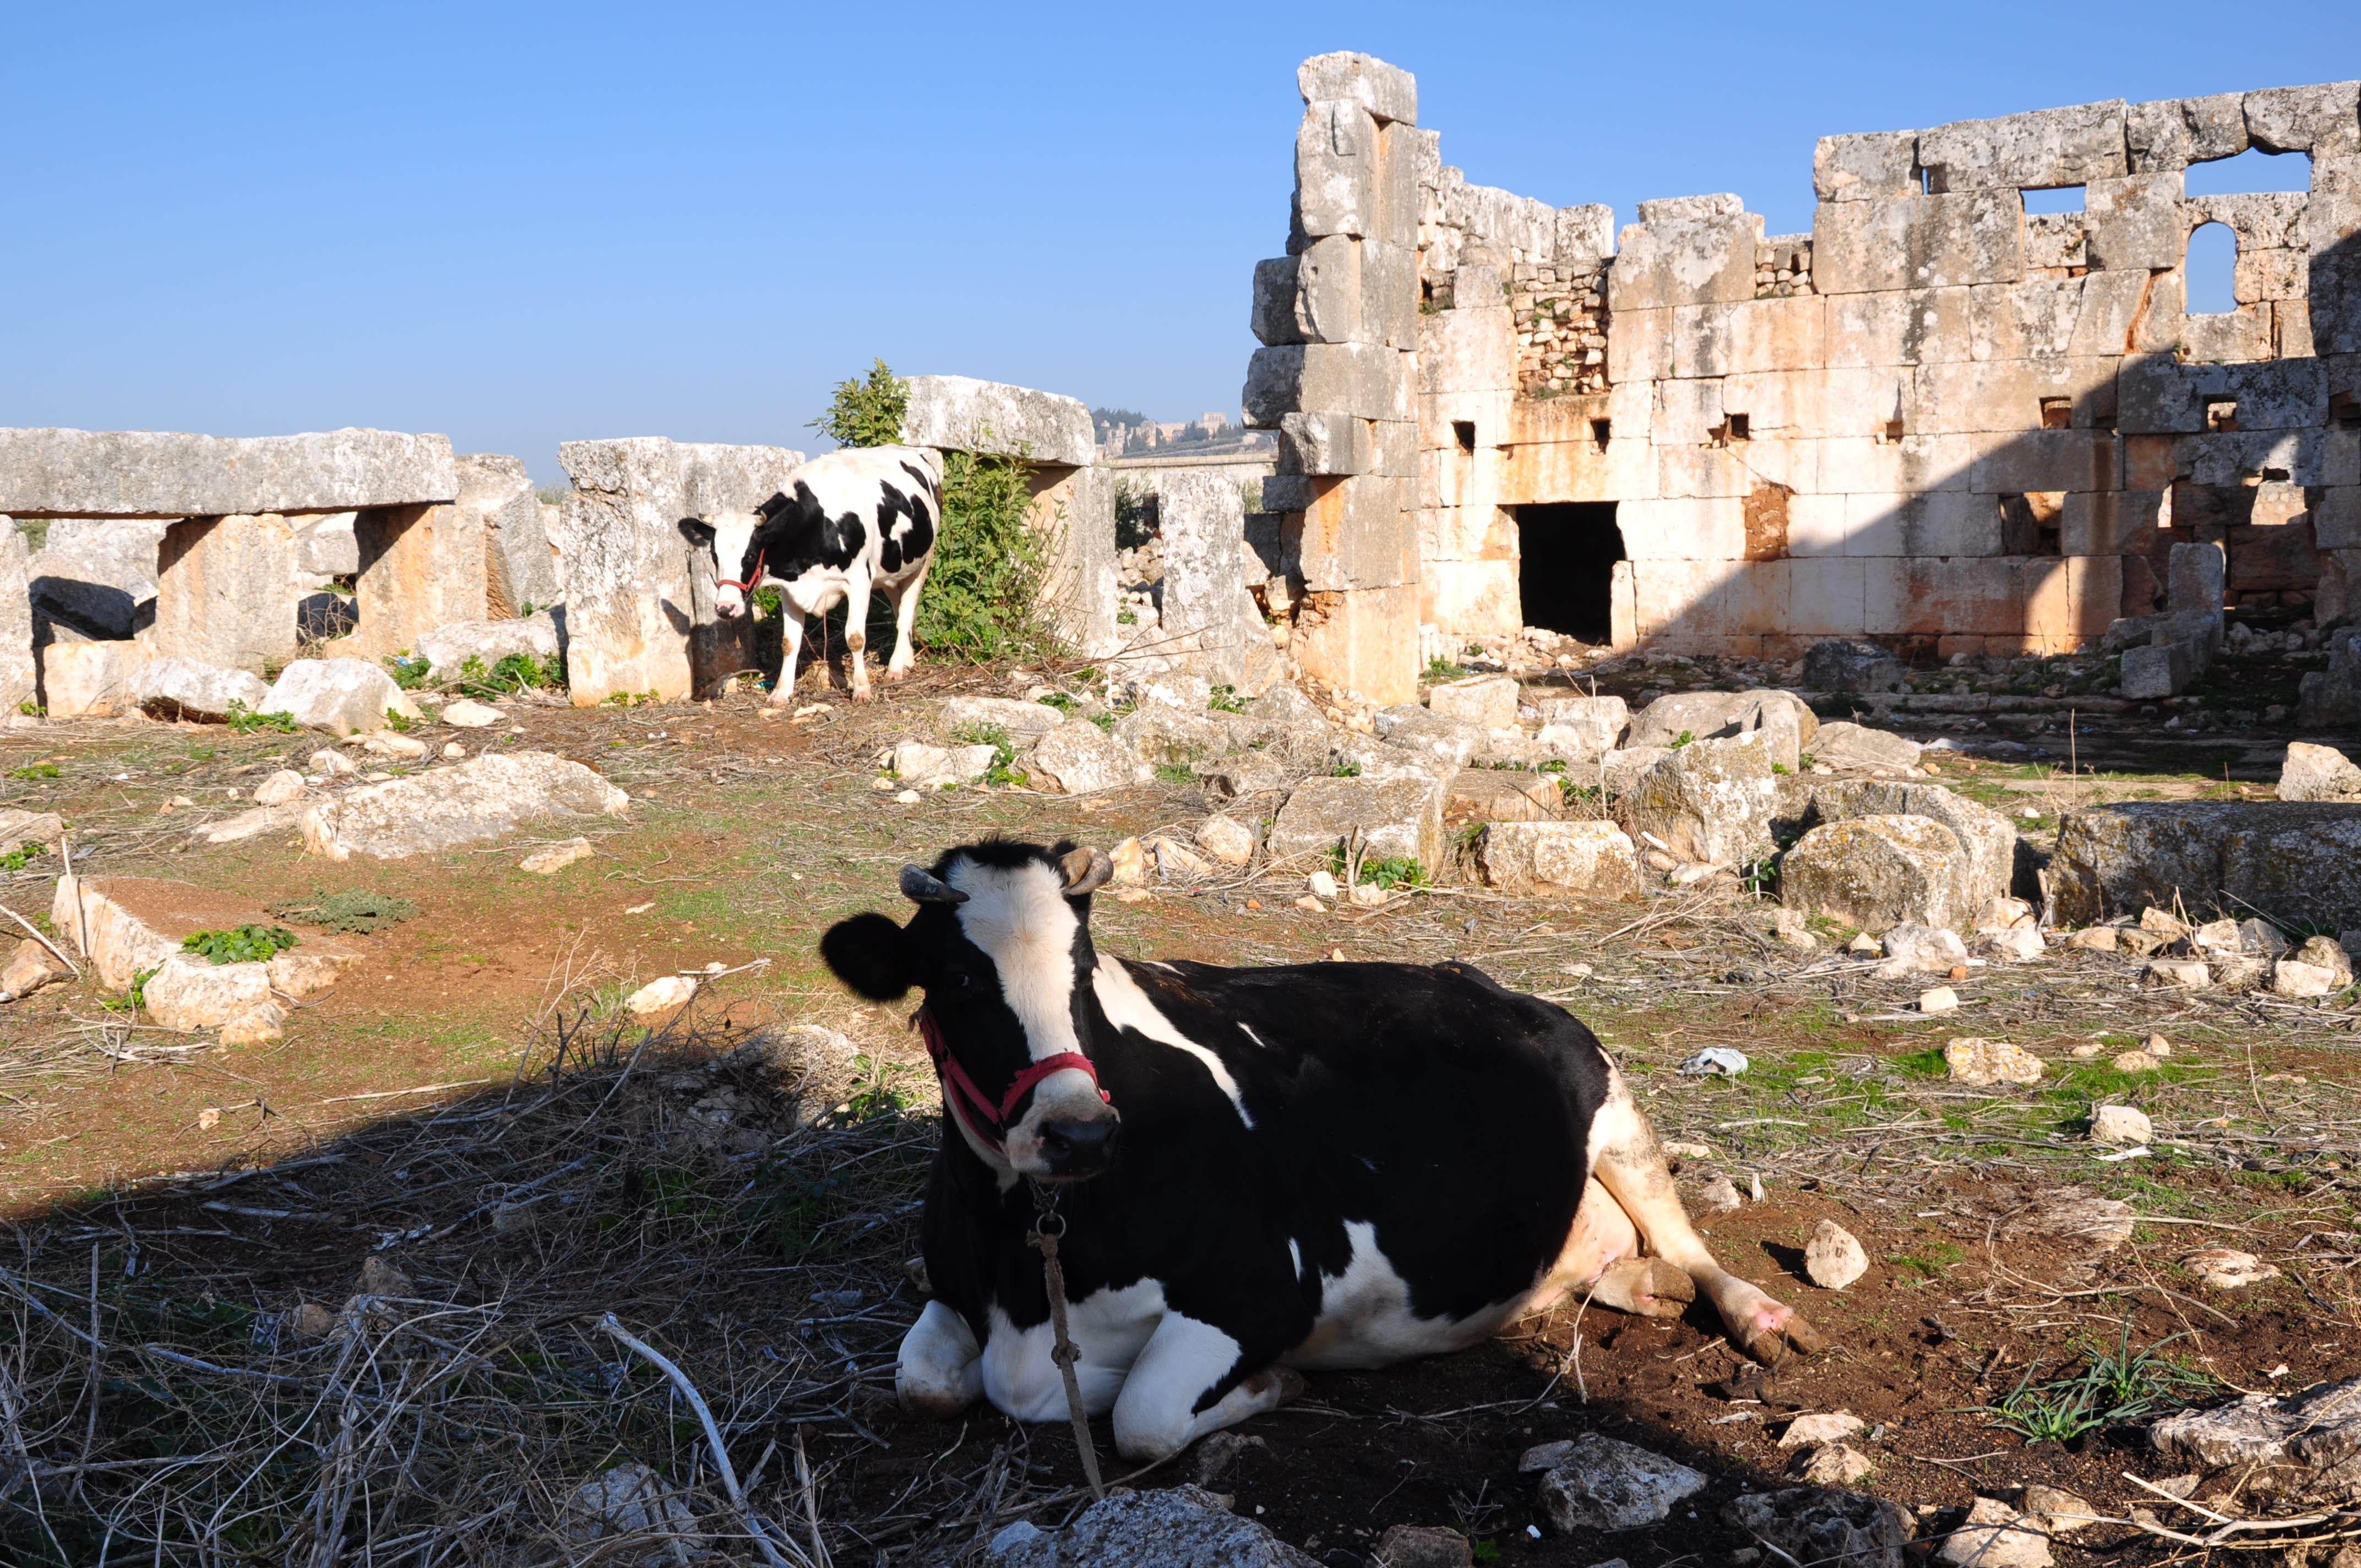 Luca Errera, Daniela Trastulli, Siria, città morte, Ancient Villages, Northern Syria